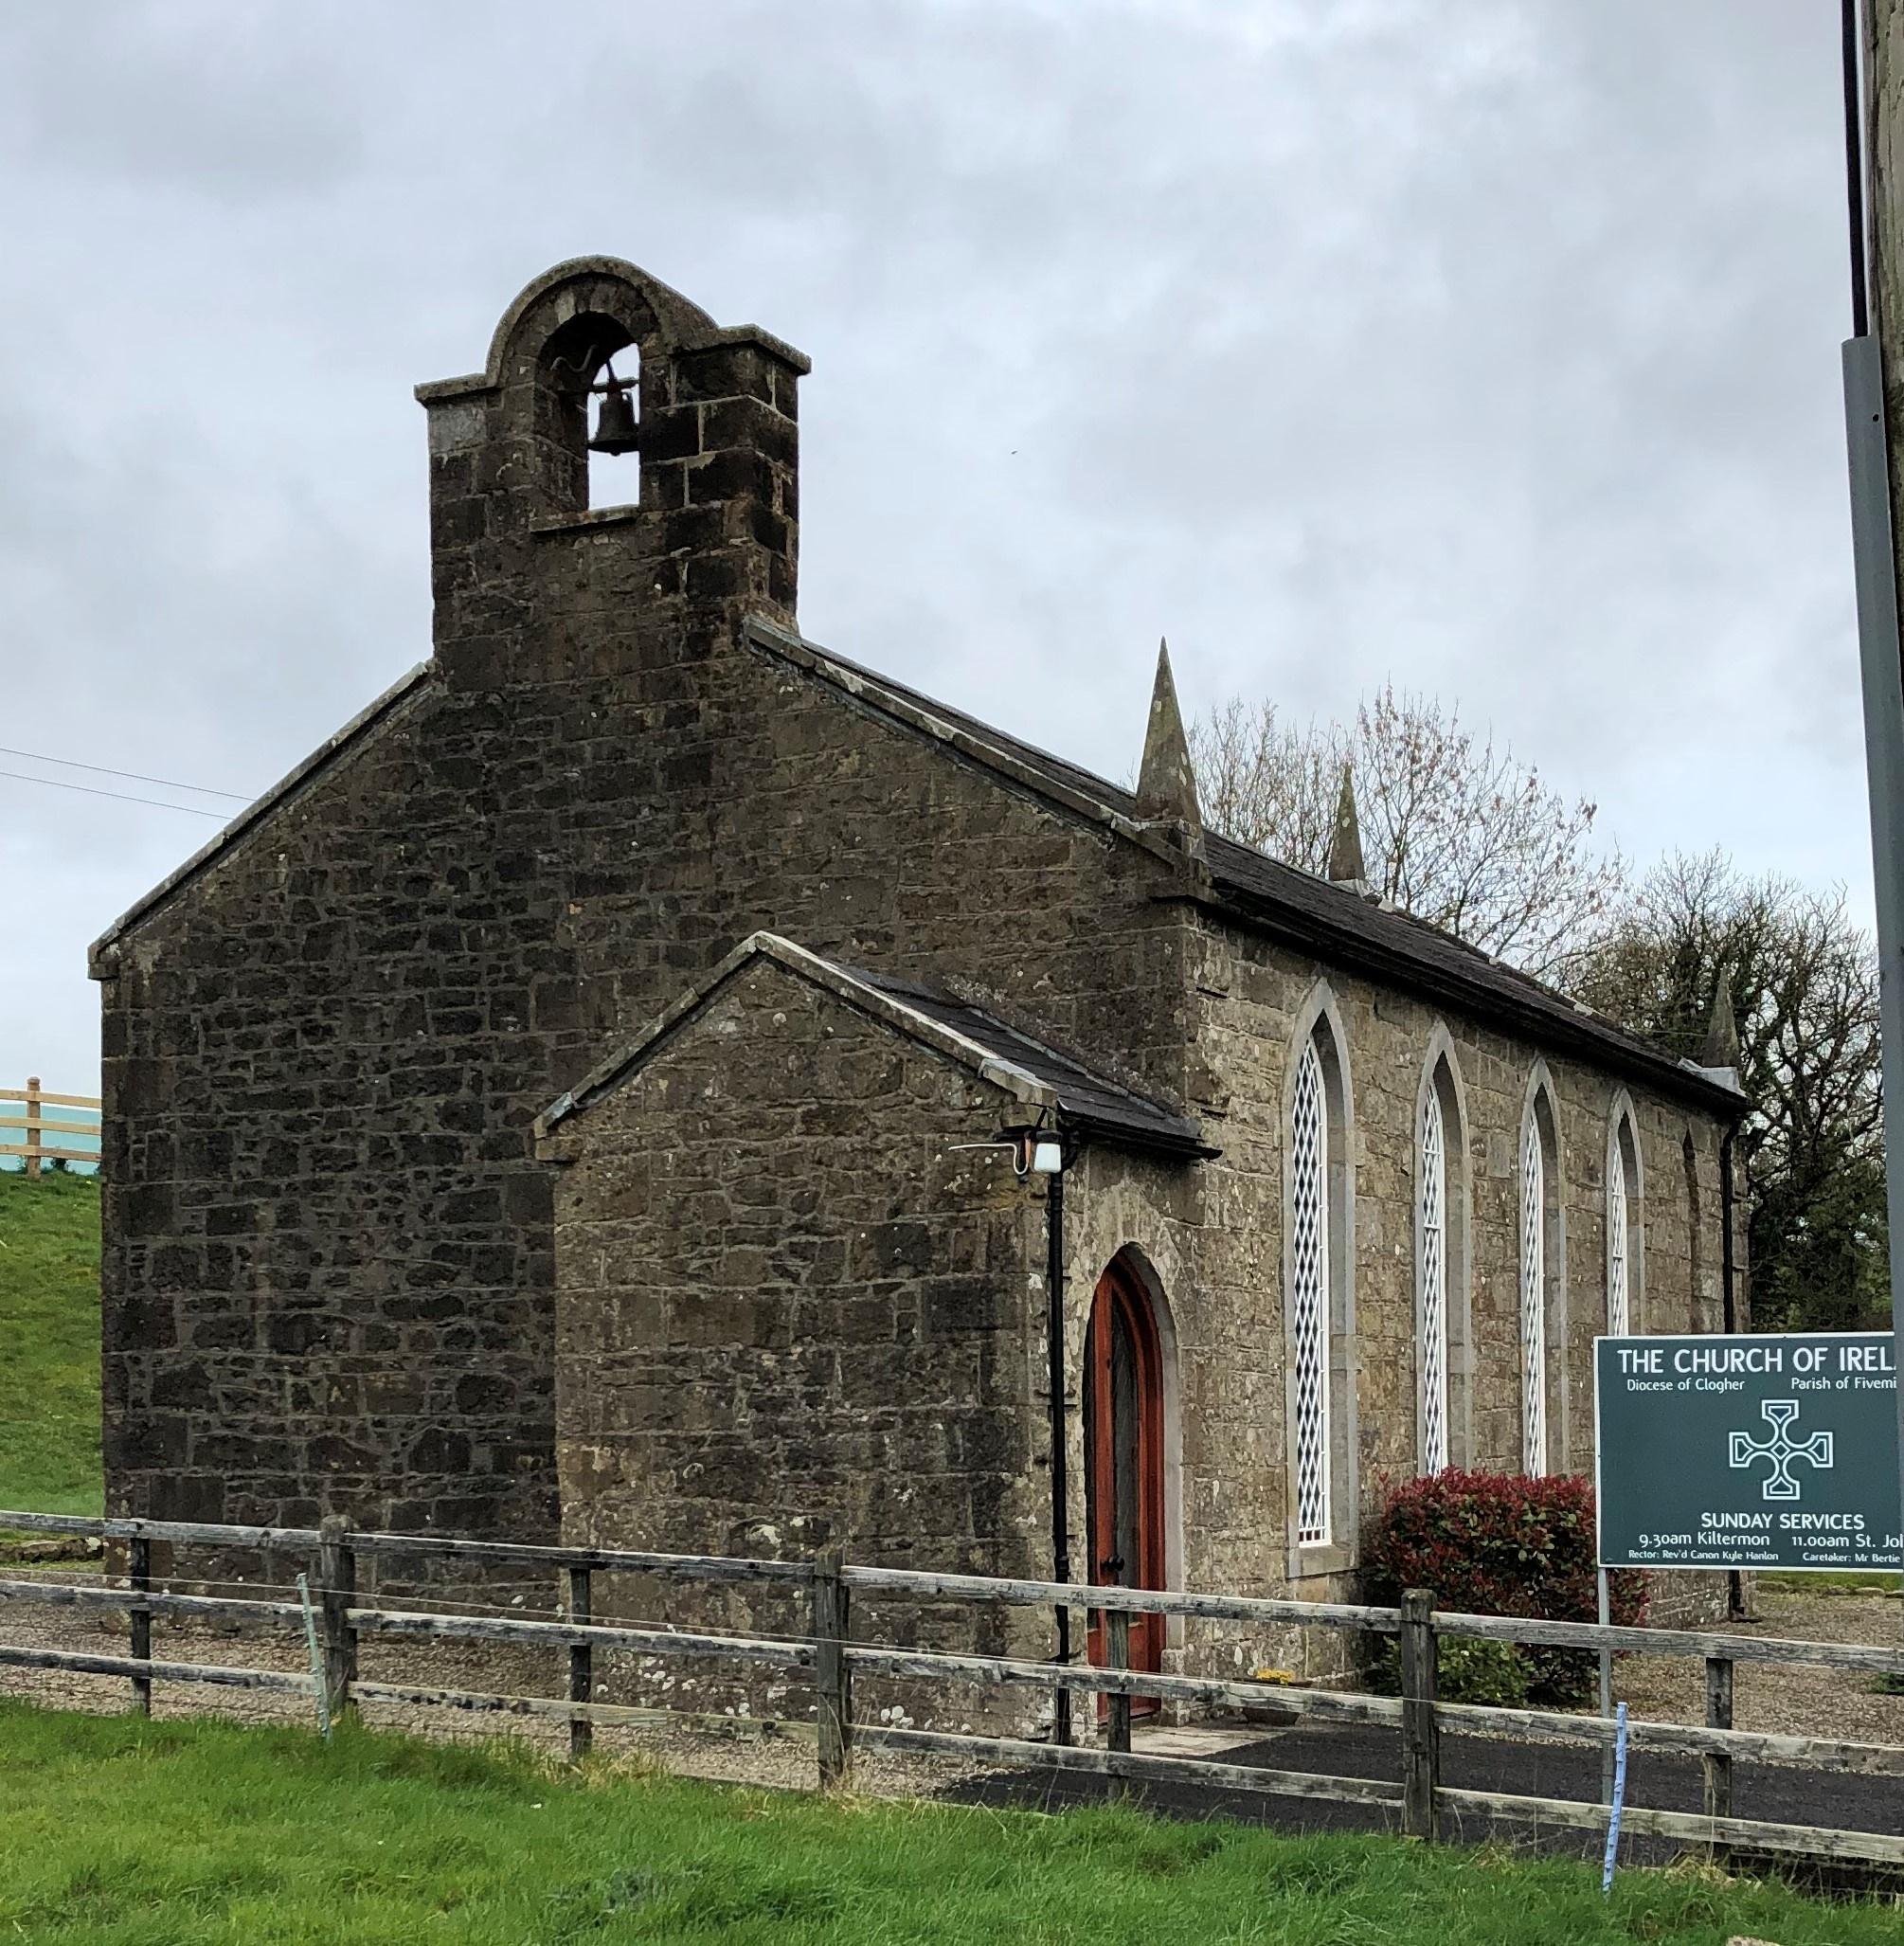 Kiltermon Church of Ireland church, Fivemiletown